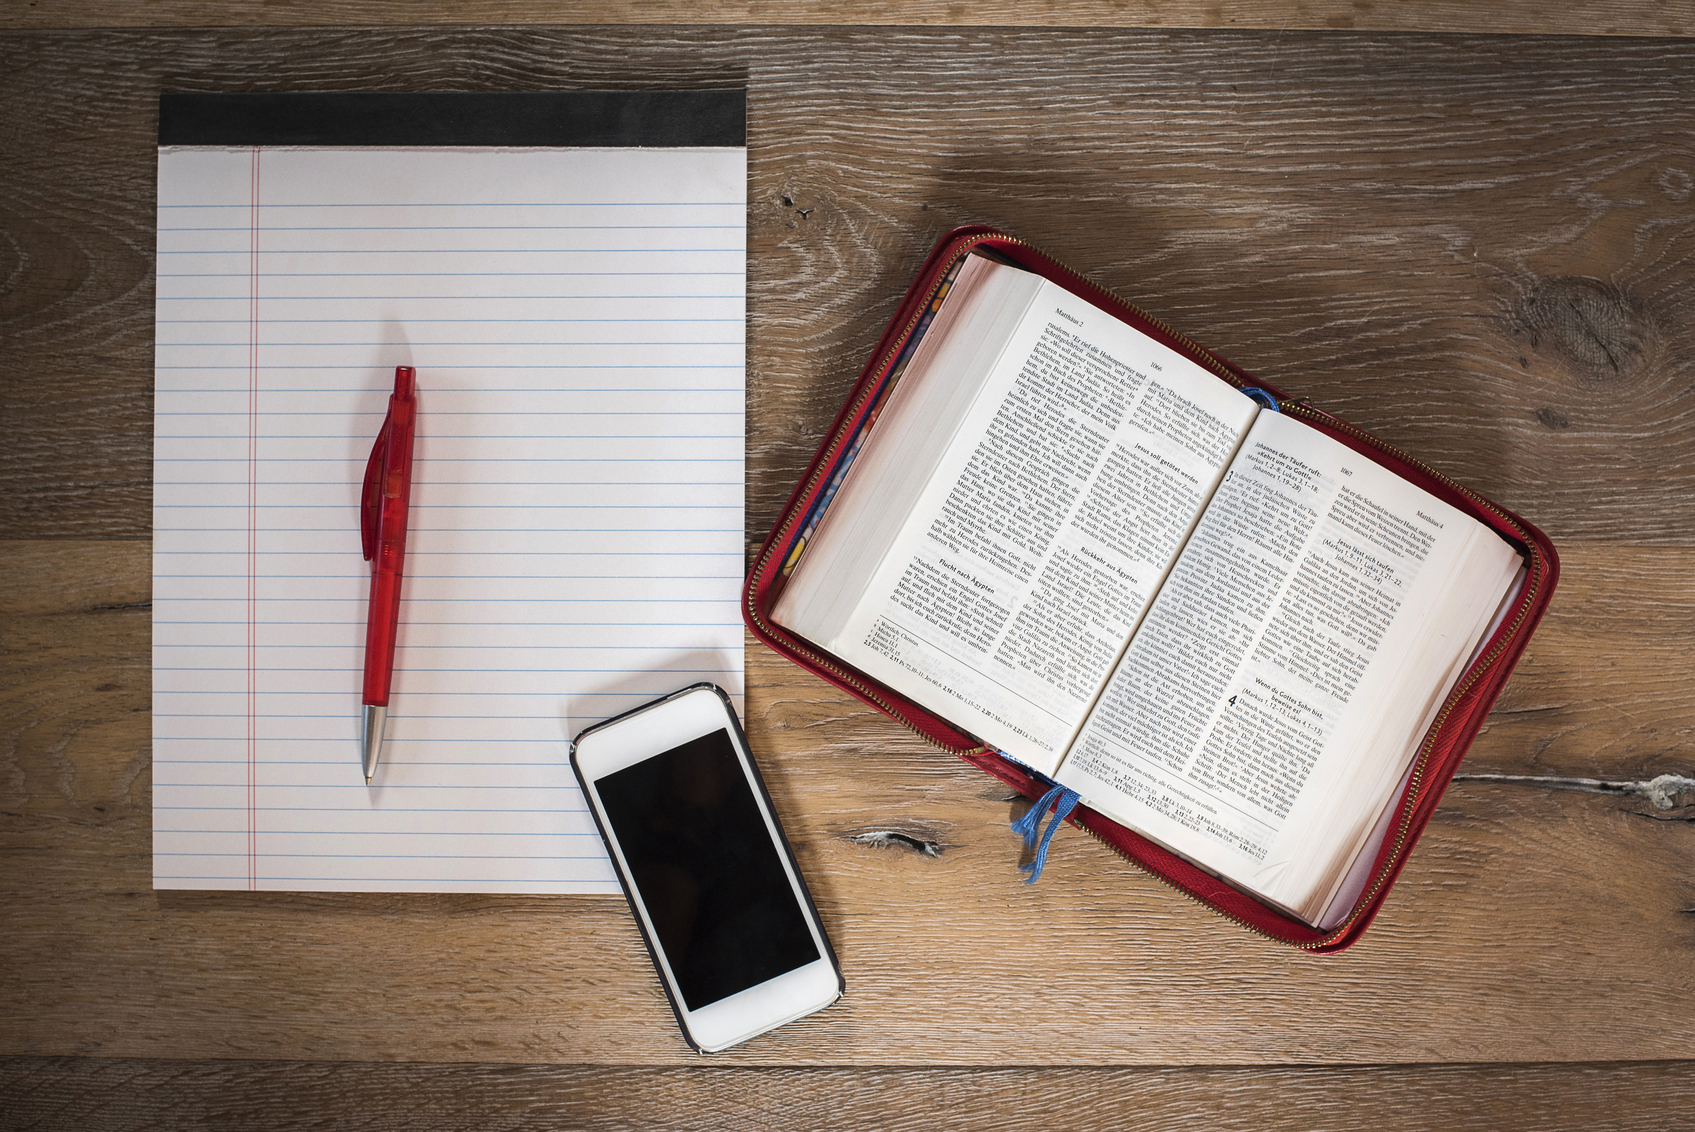 bible-iphone-legal-pad.jpg